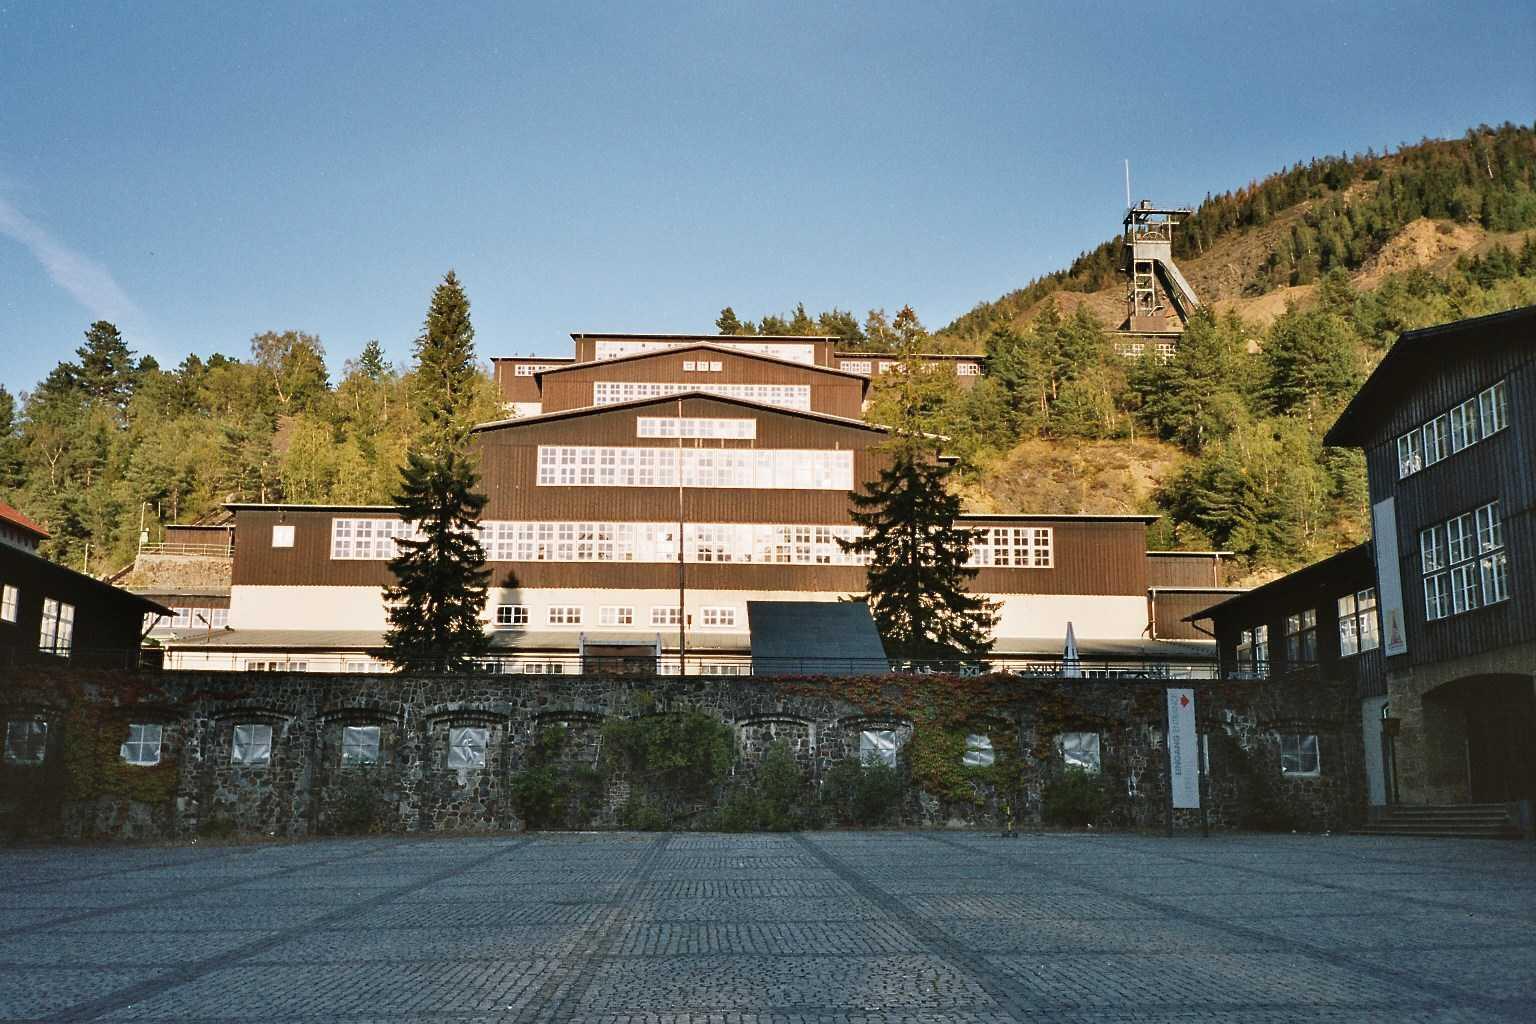 Mina de visitantes de Rammelsberg Goslar Alemania